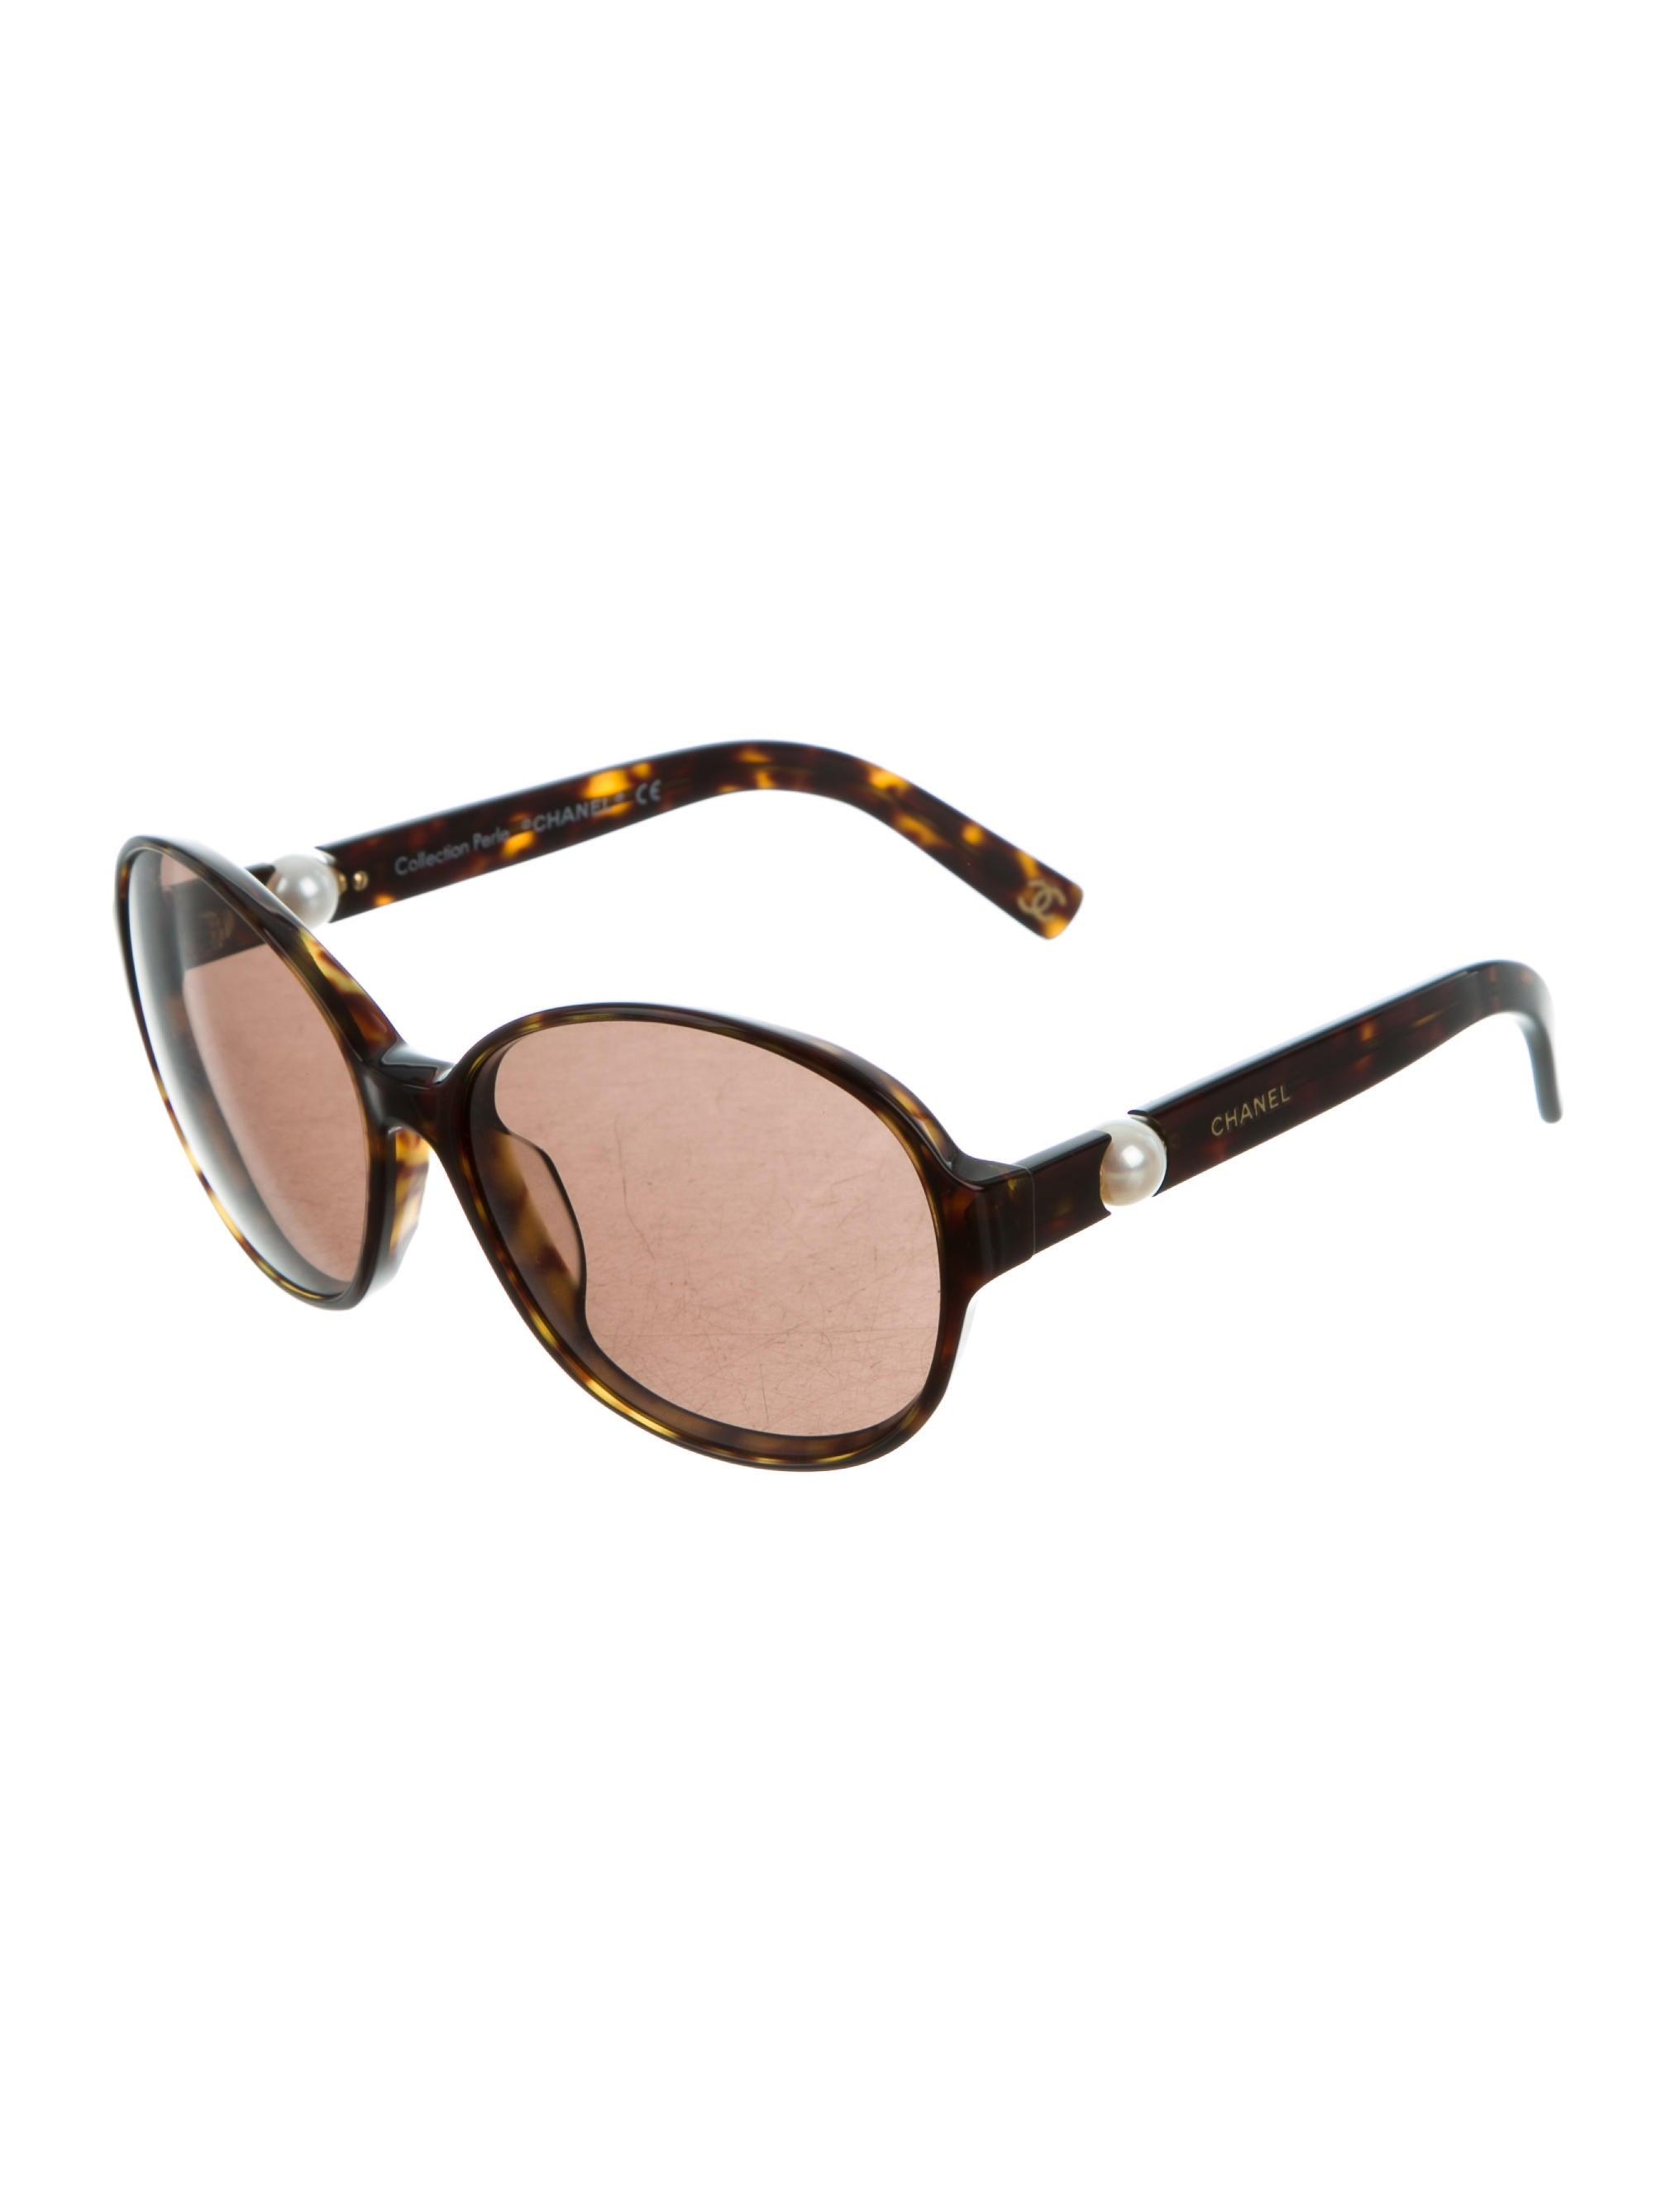 8fb719a5b11 Chanel Perle Tortoiseshell Sunglasses - Accessories - CHA189275